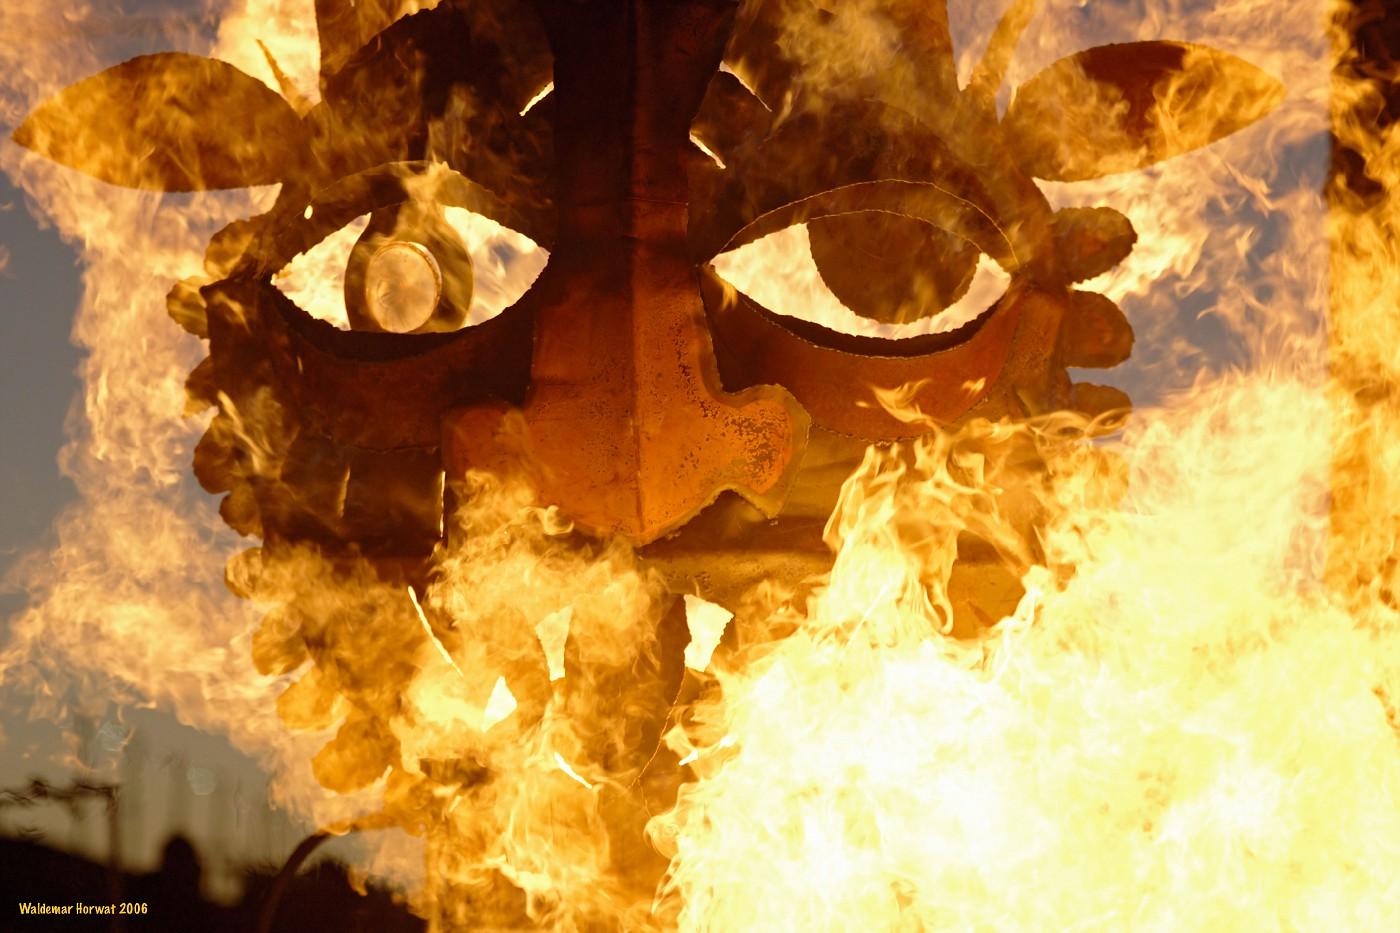 Idol in Flames